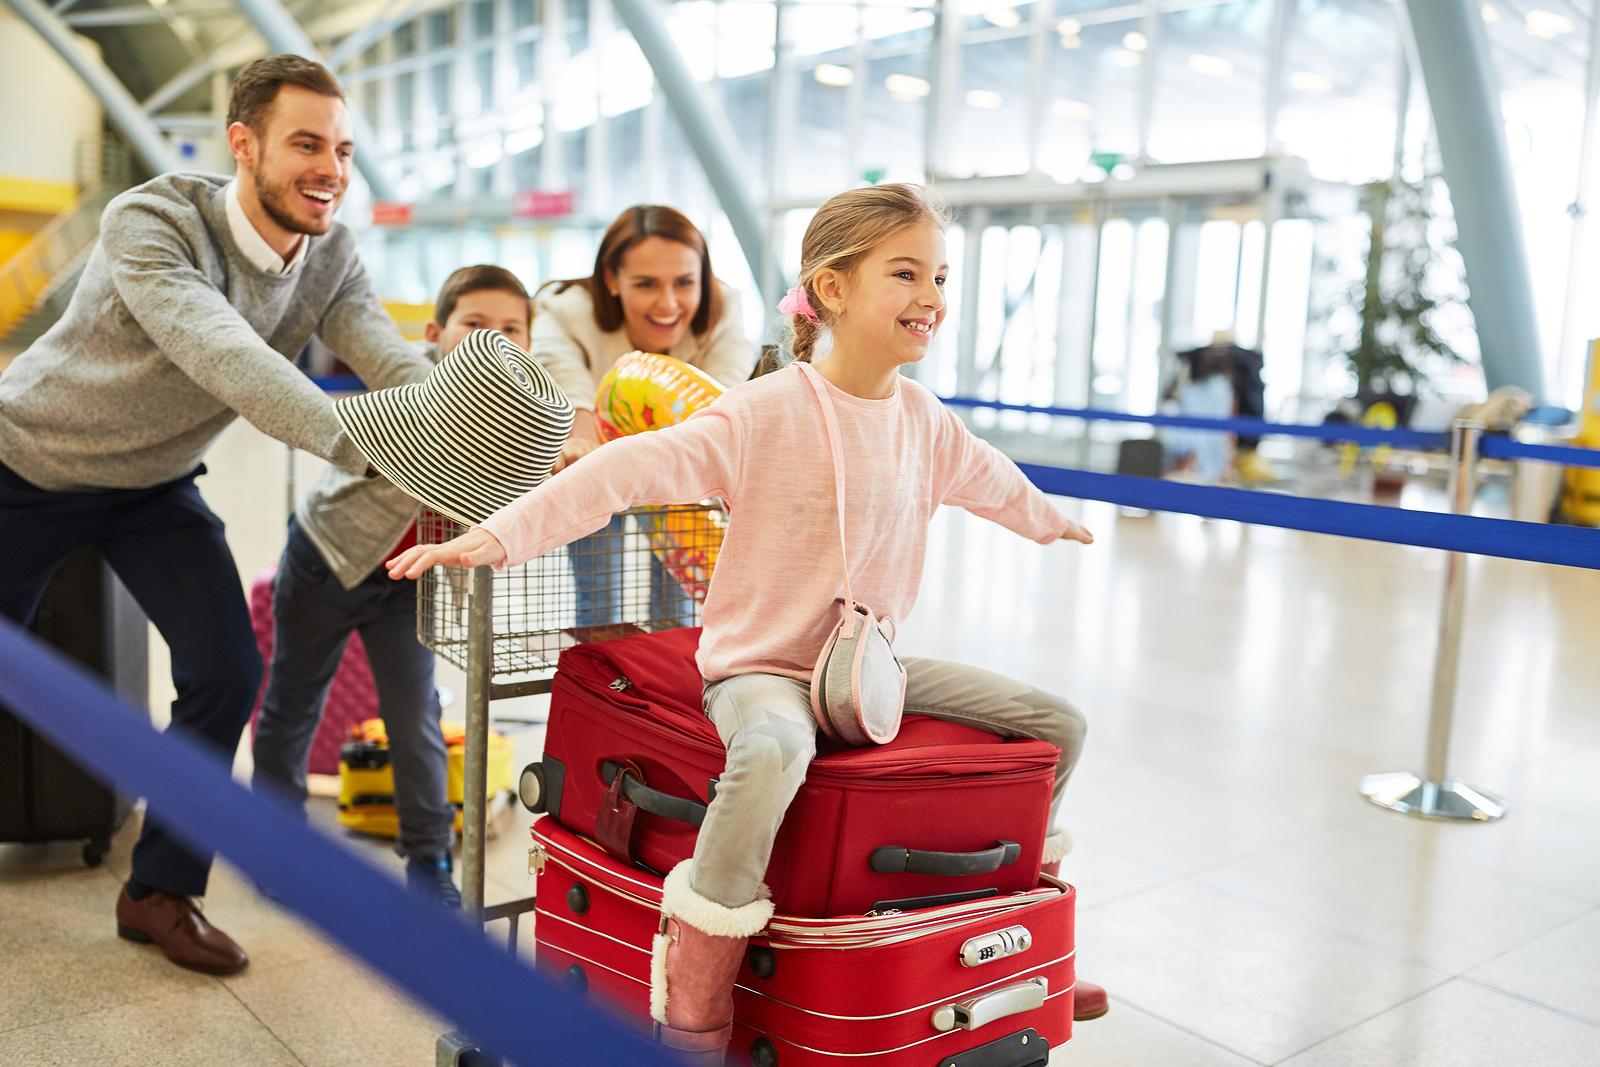 2m Brits Jet Off As Summer Holidays Begin